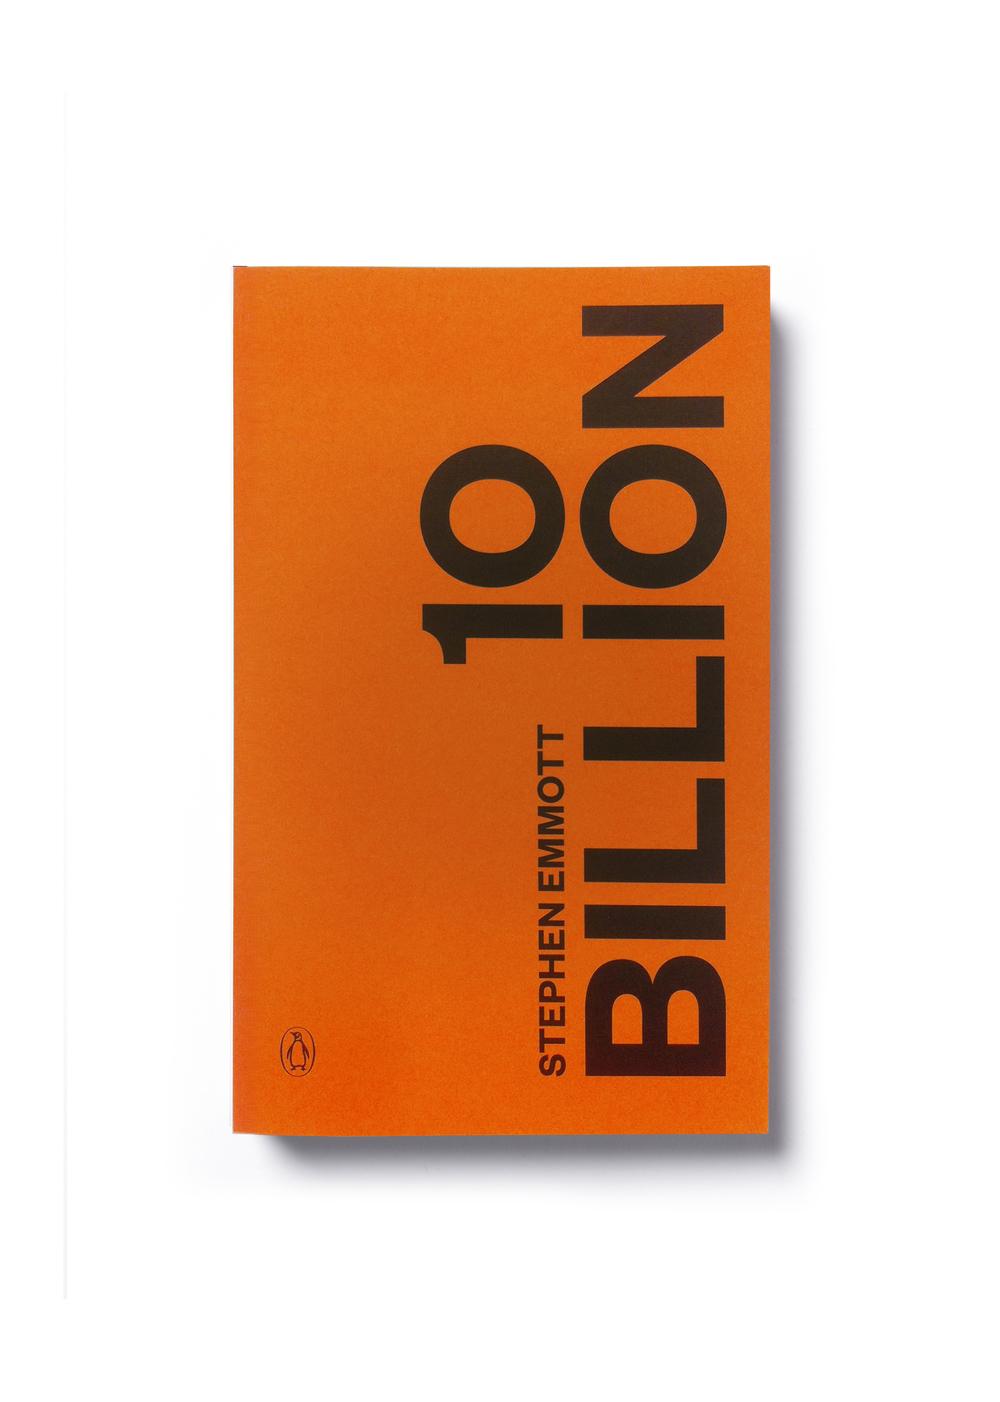 Ten Billion by Stephen Emmott - Art Direction: Jim Stoddart Design: Yes Studio